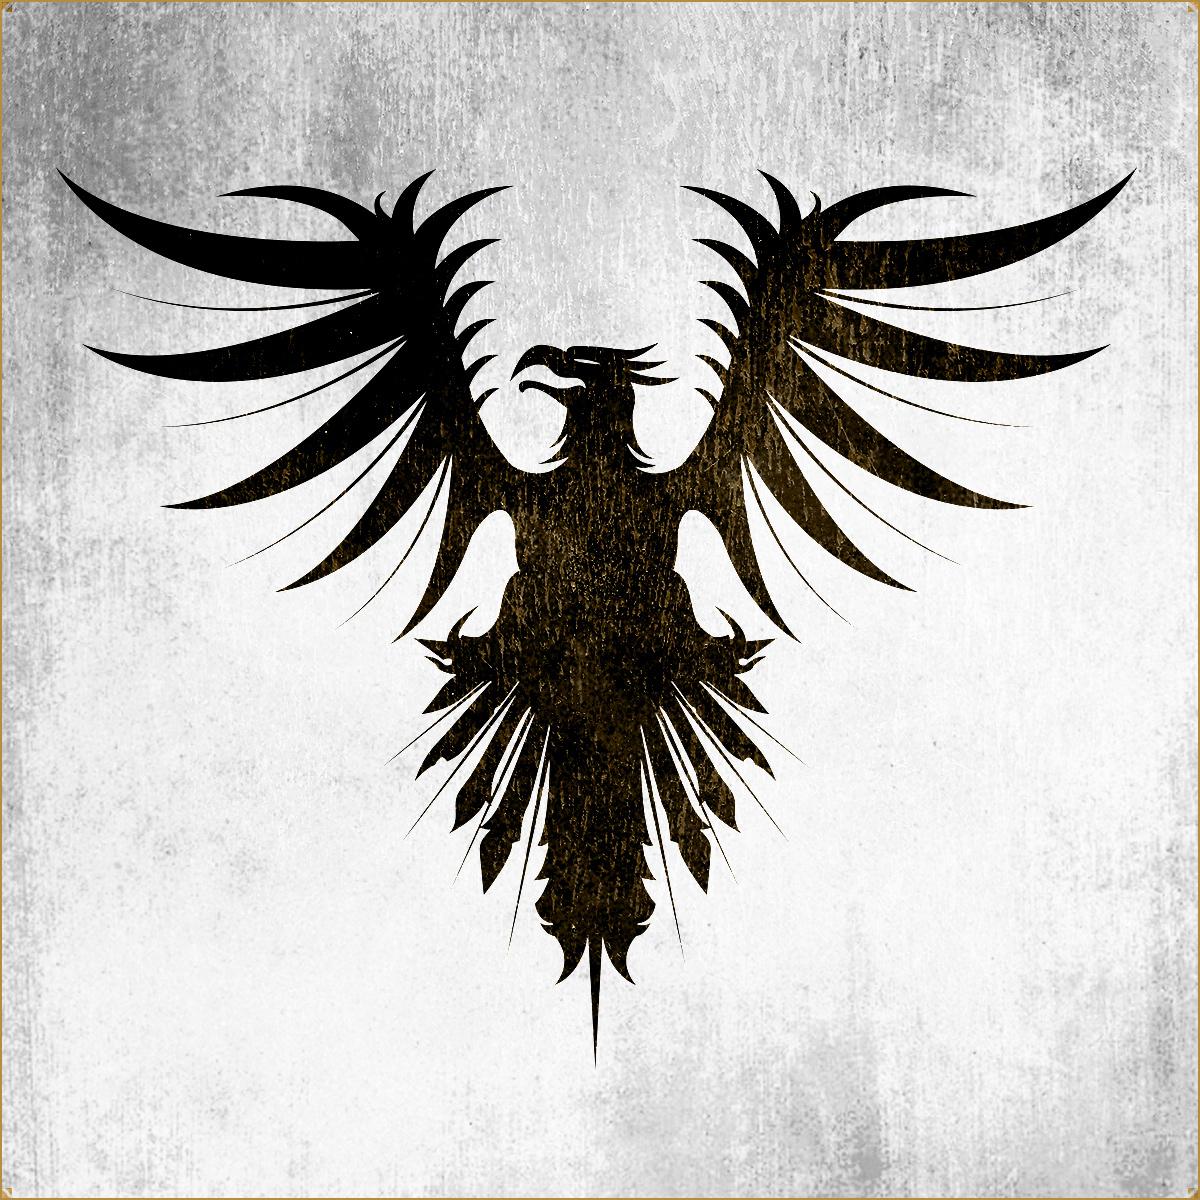 BricolArts - Artist profile picture - MadeInRealtime logo